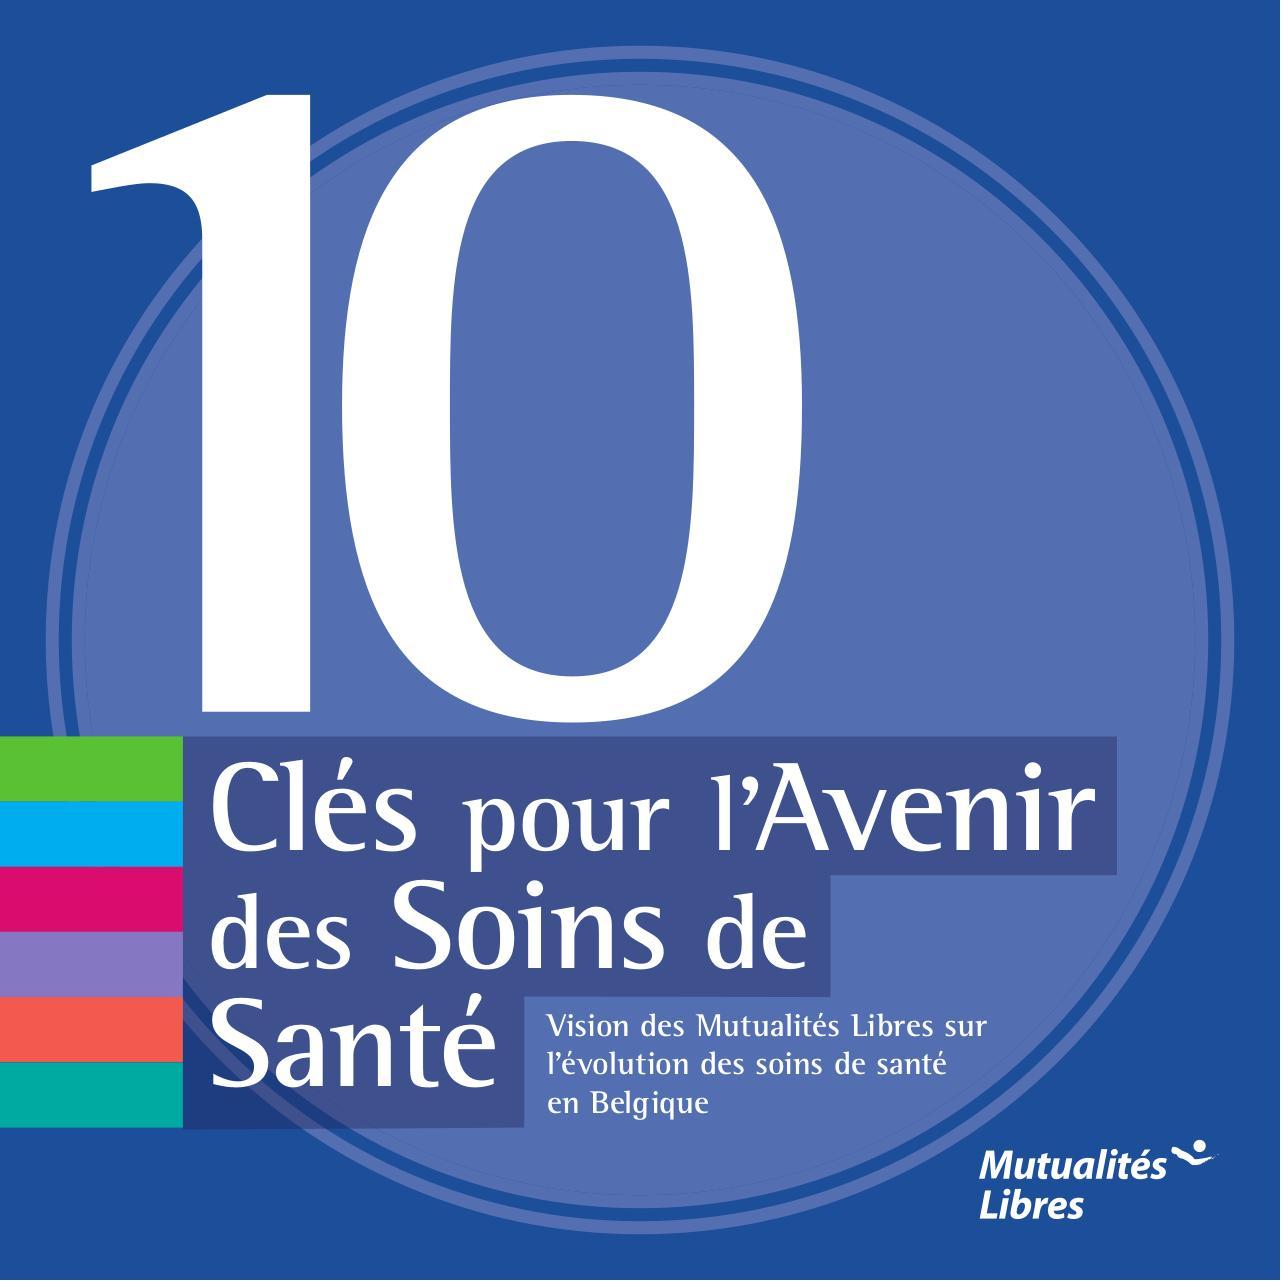 Carte Europeenne Dassurance Maladie Omnimut.Brochure Fr Indd Avenir Soins De Sante Belgique Mutualites Libres